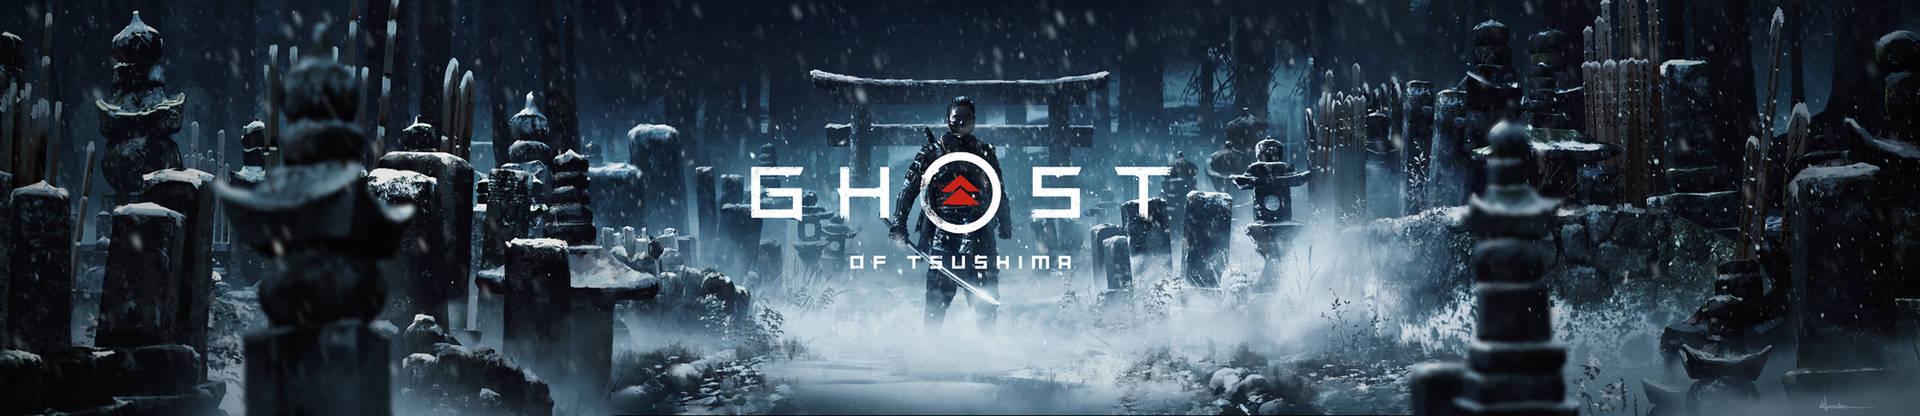 Ghost of Tsushima Key Art